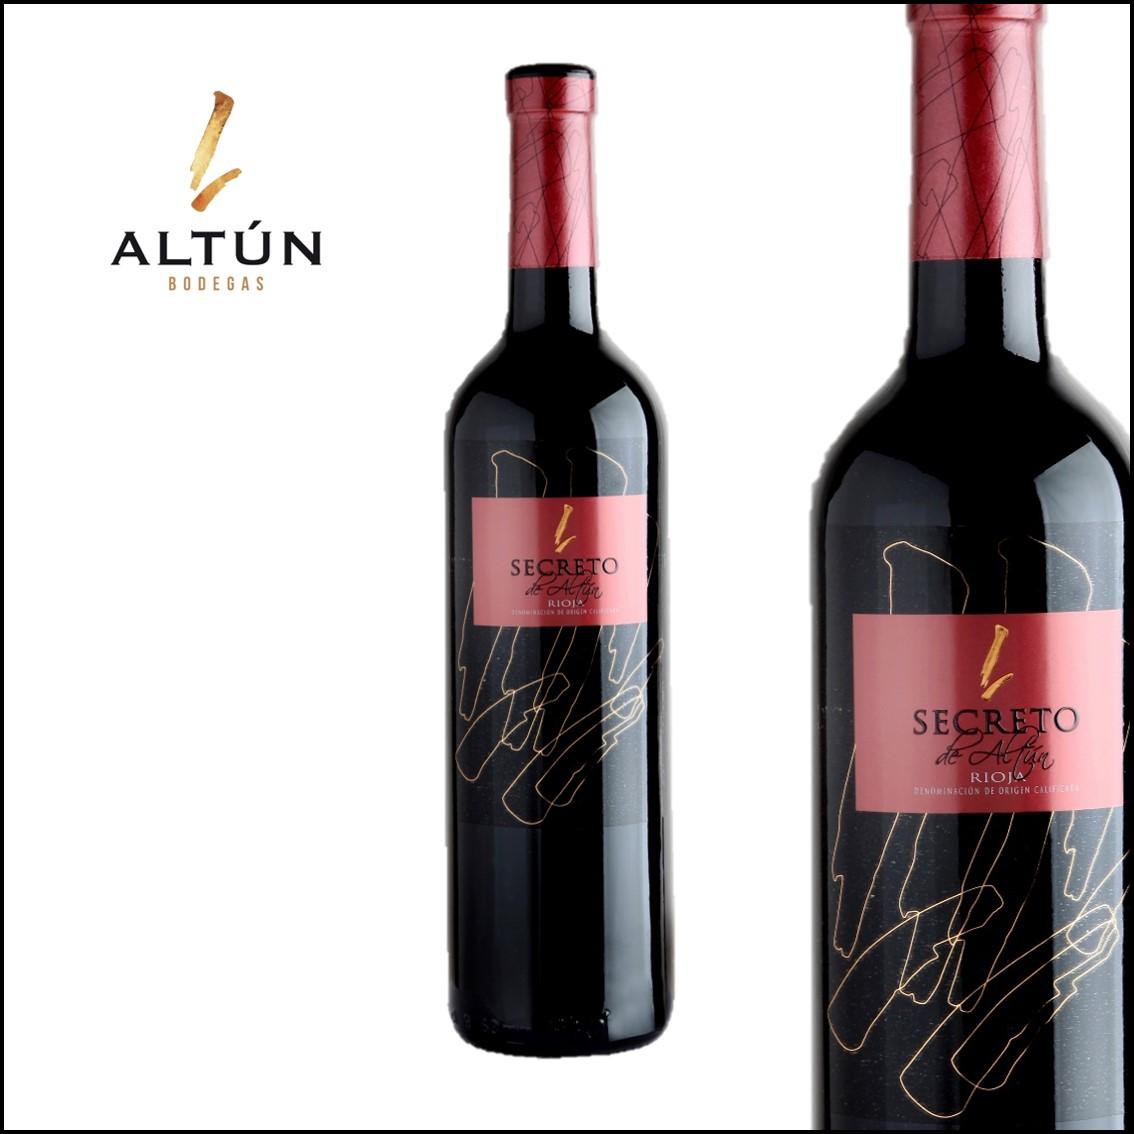 Altún «Secreto de Altún» D.O.Ca. Rioja